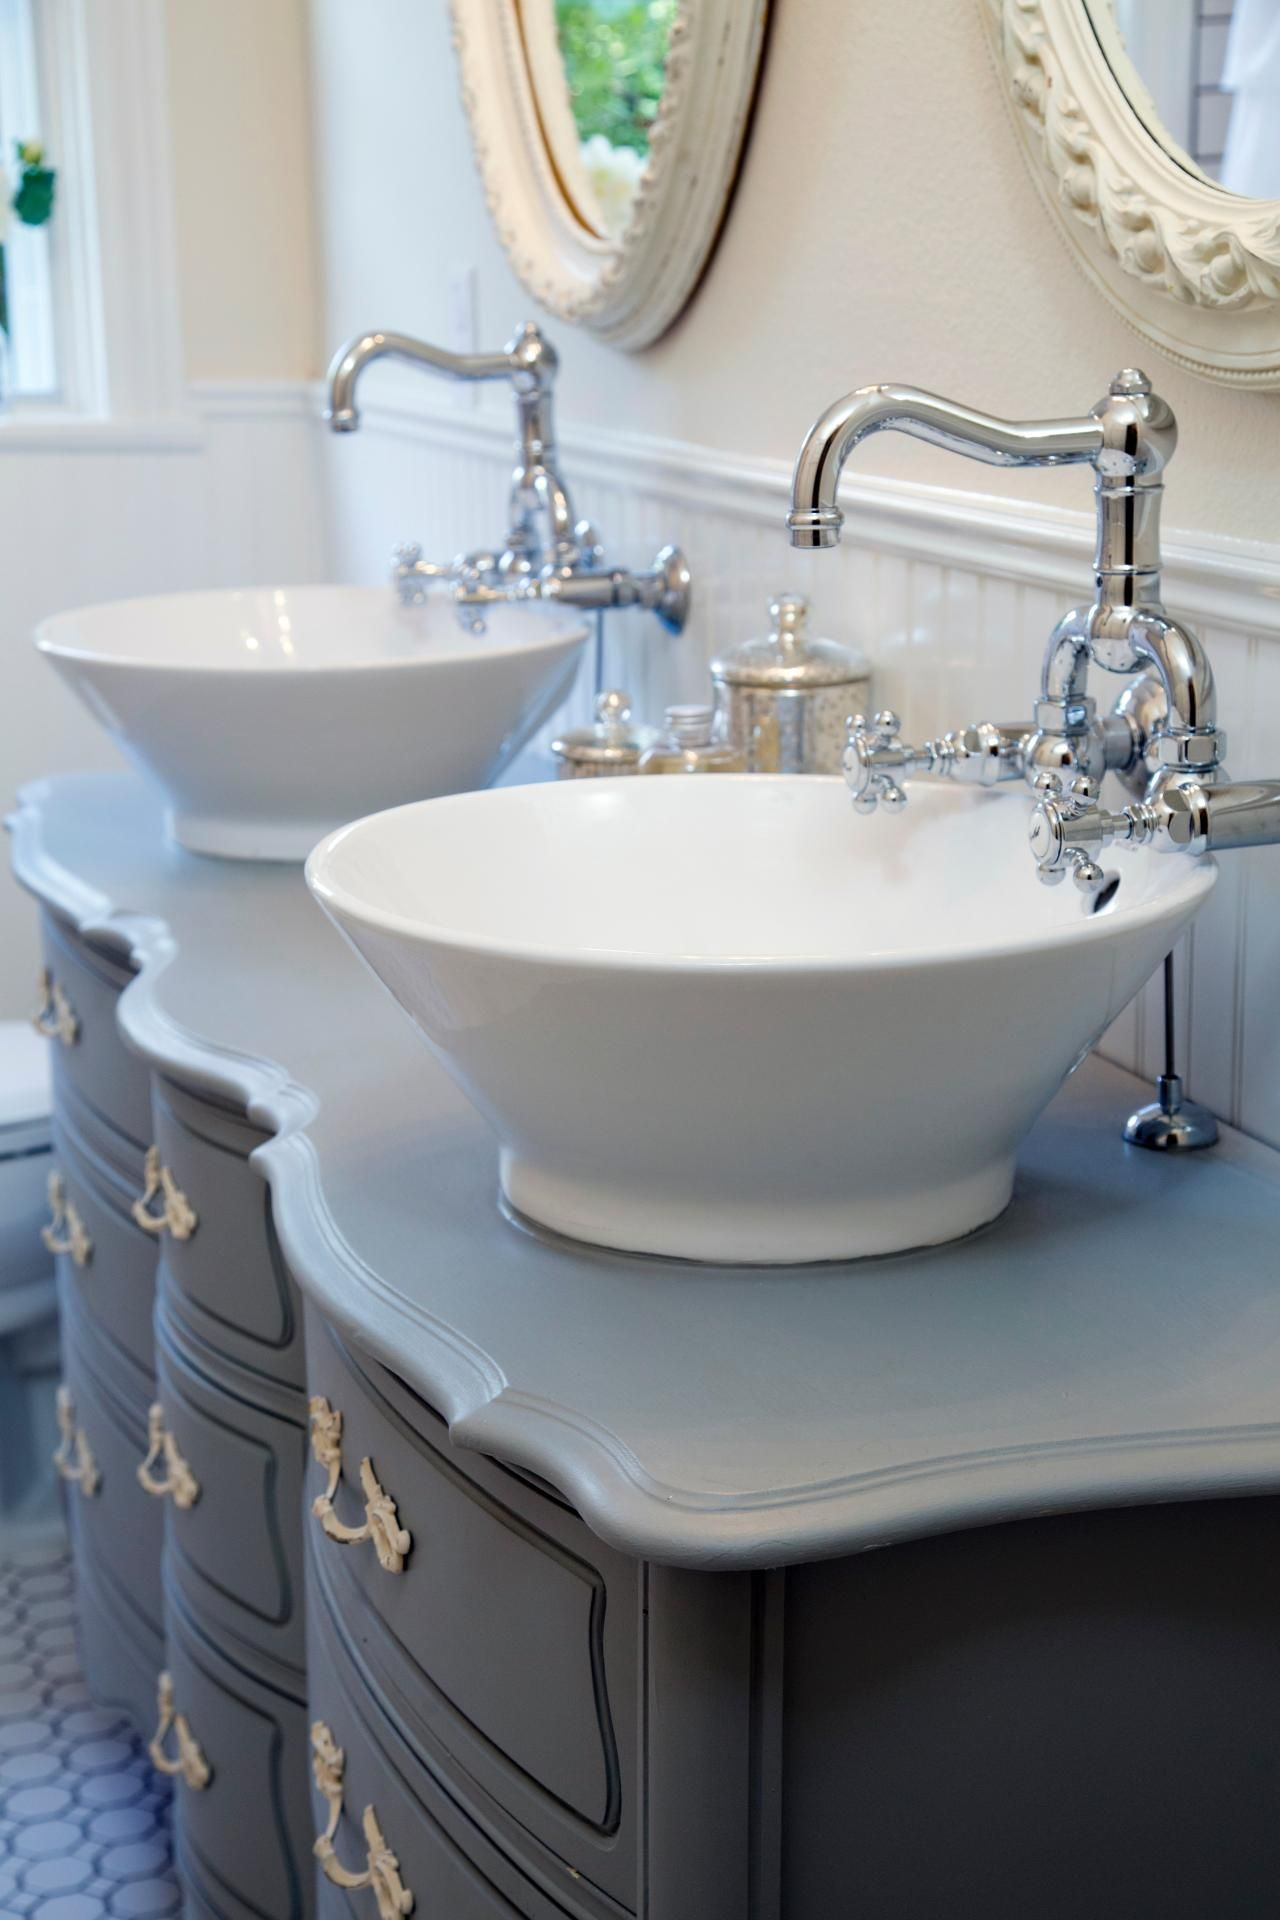 Badezimmer eitelkeiten vermont  things every ufixer upperuinspired farmhouse bathroom needs in